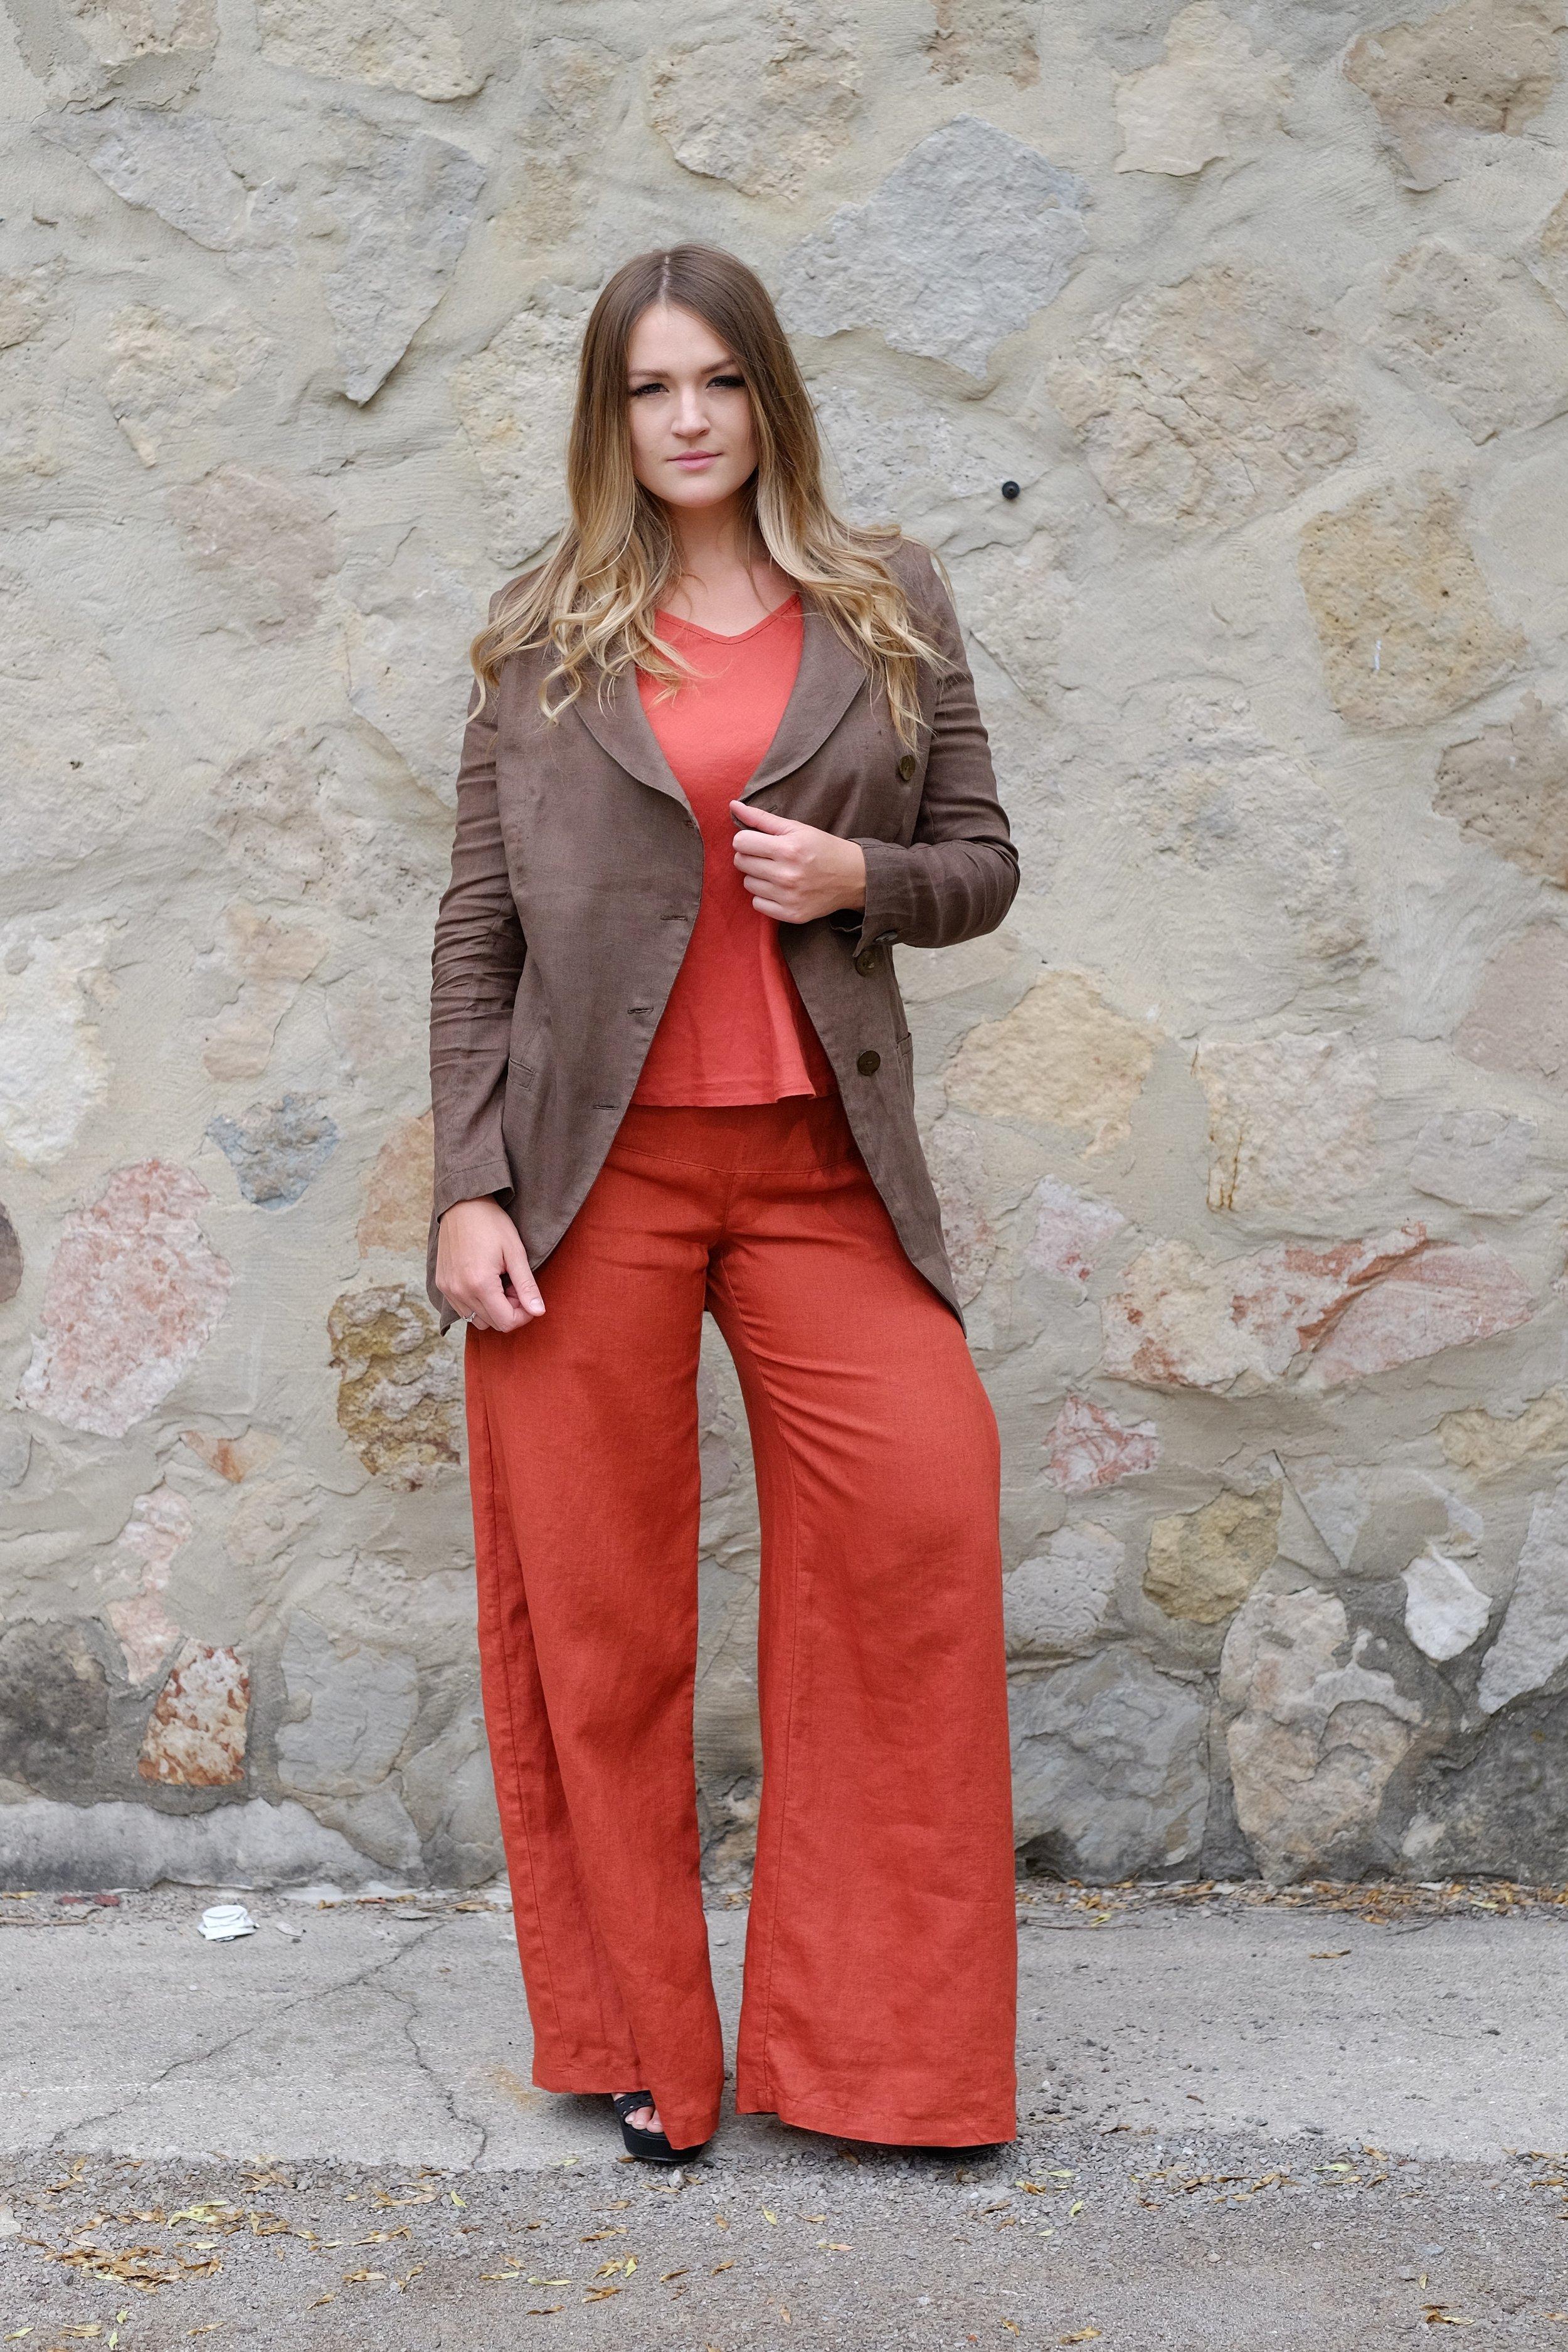 Asymmetrical Jacket and Retro Pant